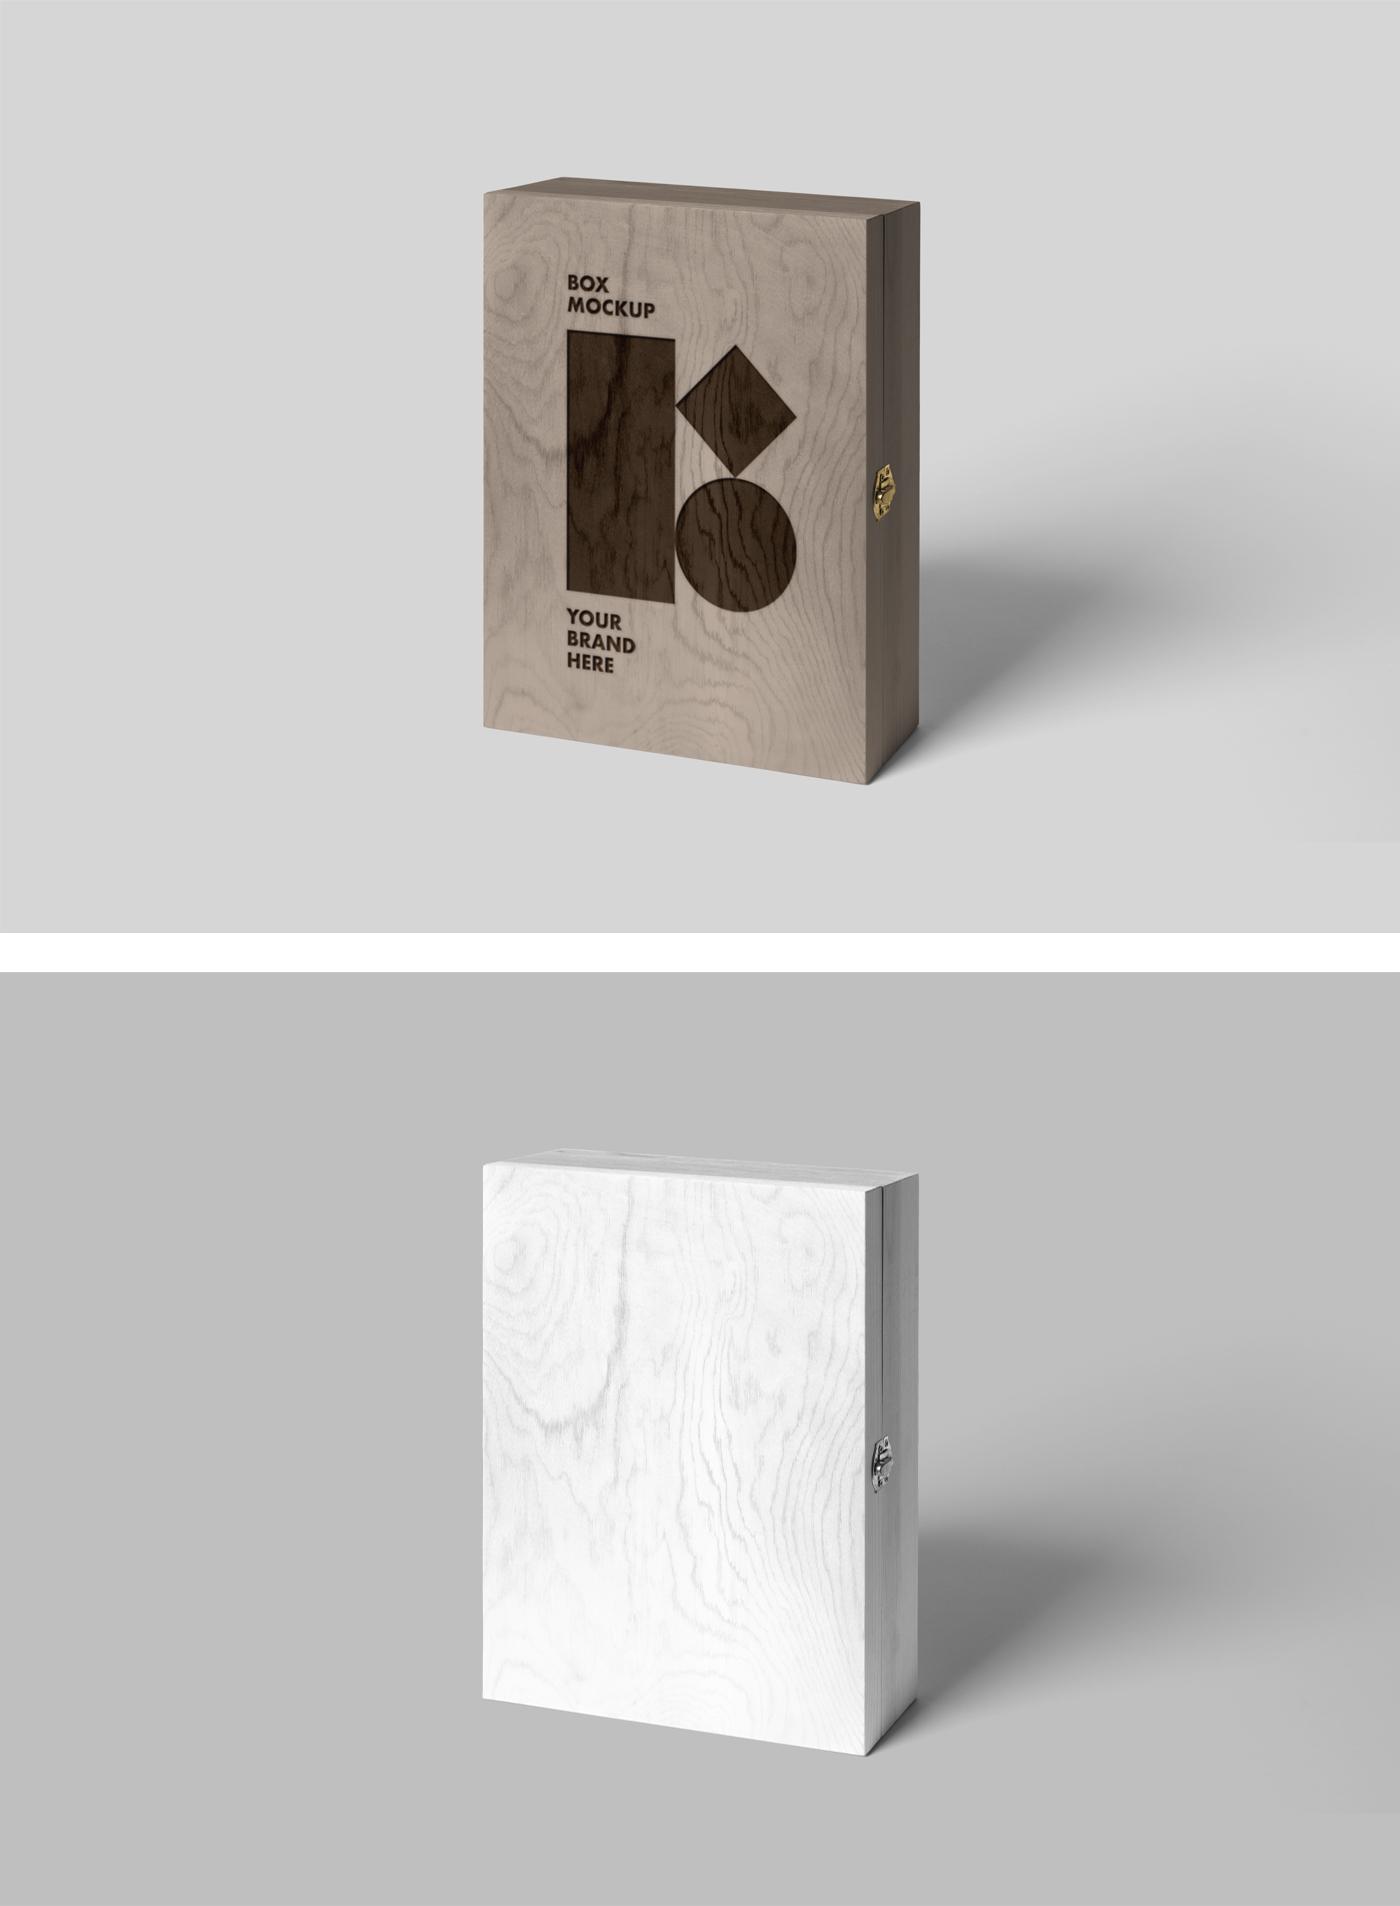 Wood Box Mockup